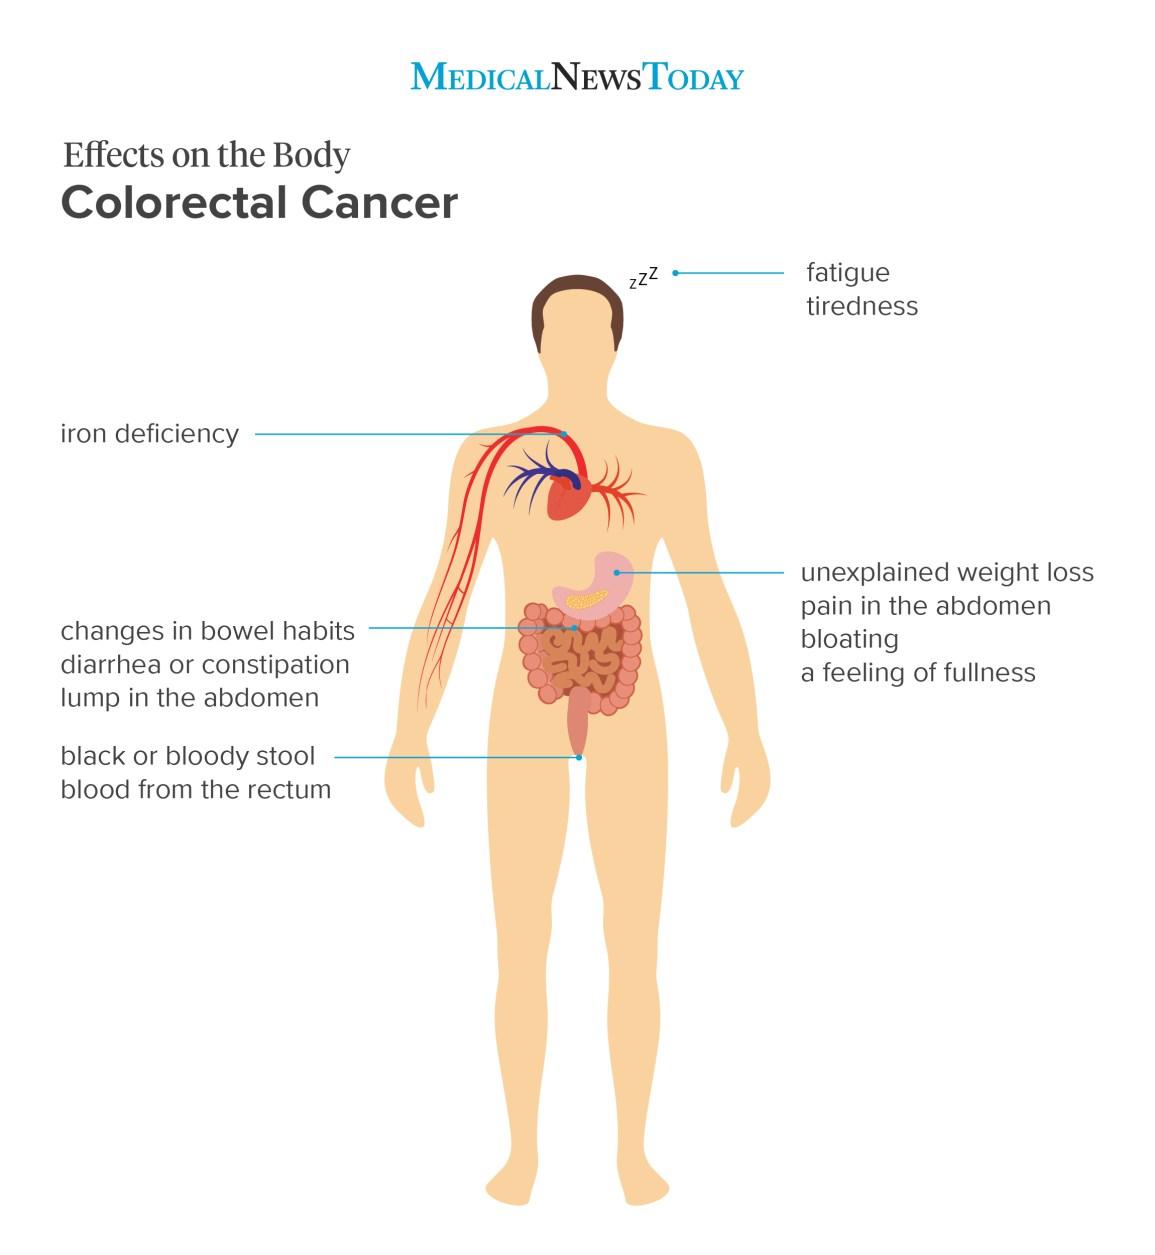 Varsta influenteaza evolutia clinica si moleculara a cancerului colorectal?